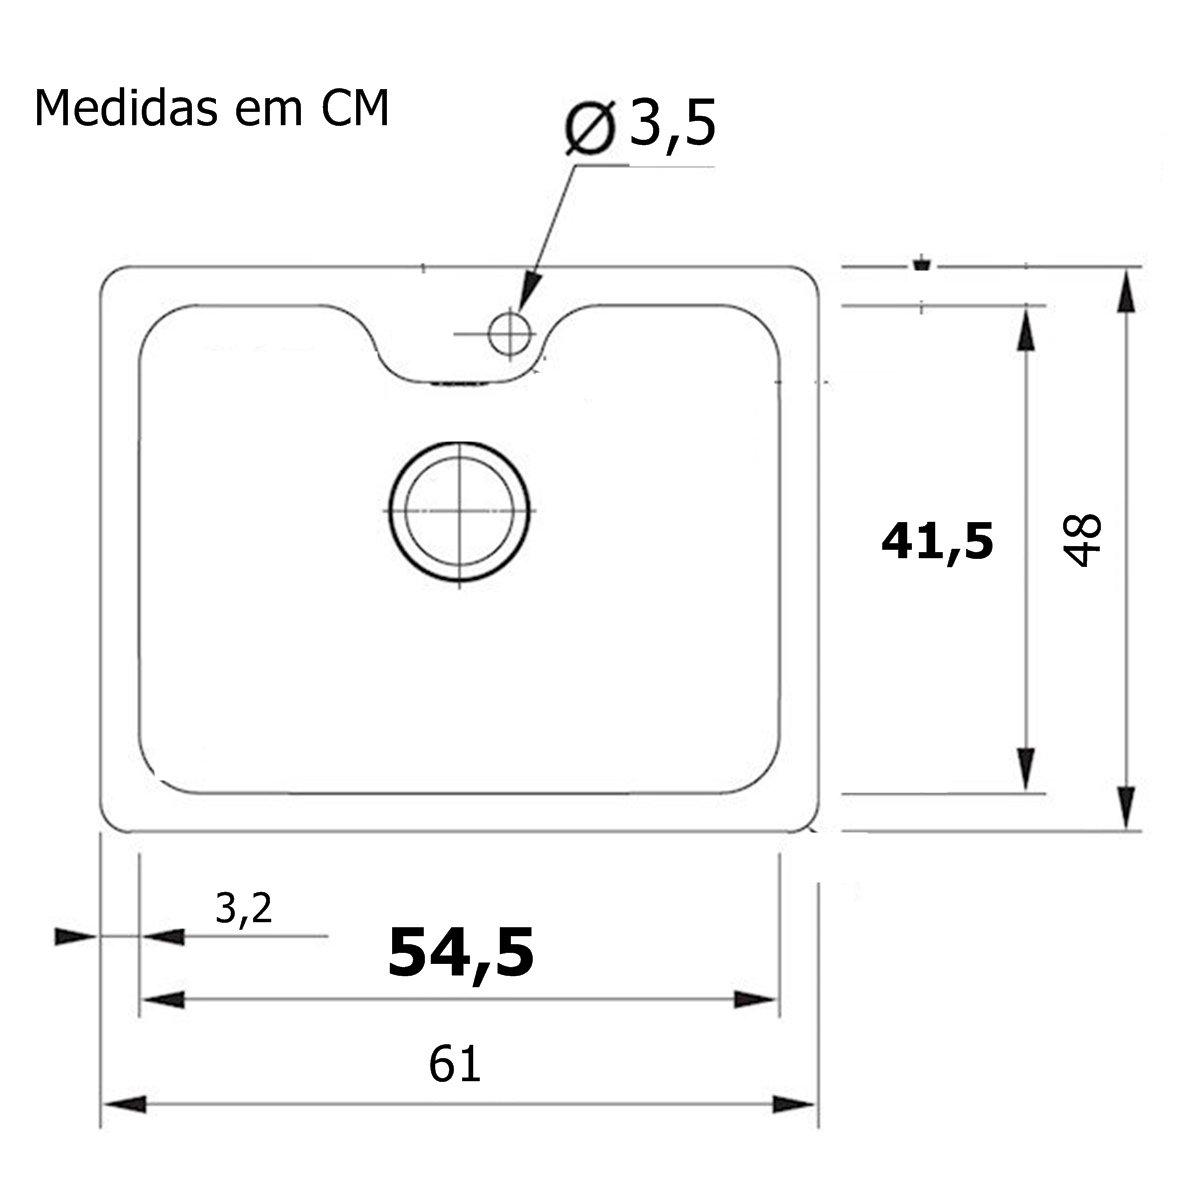 Cuba Inox Bell De Embutir 54cm Com Acessórios